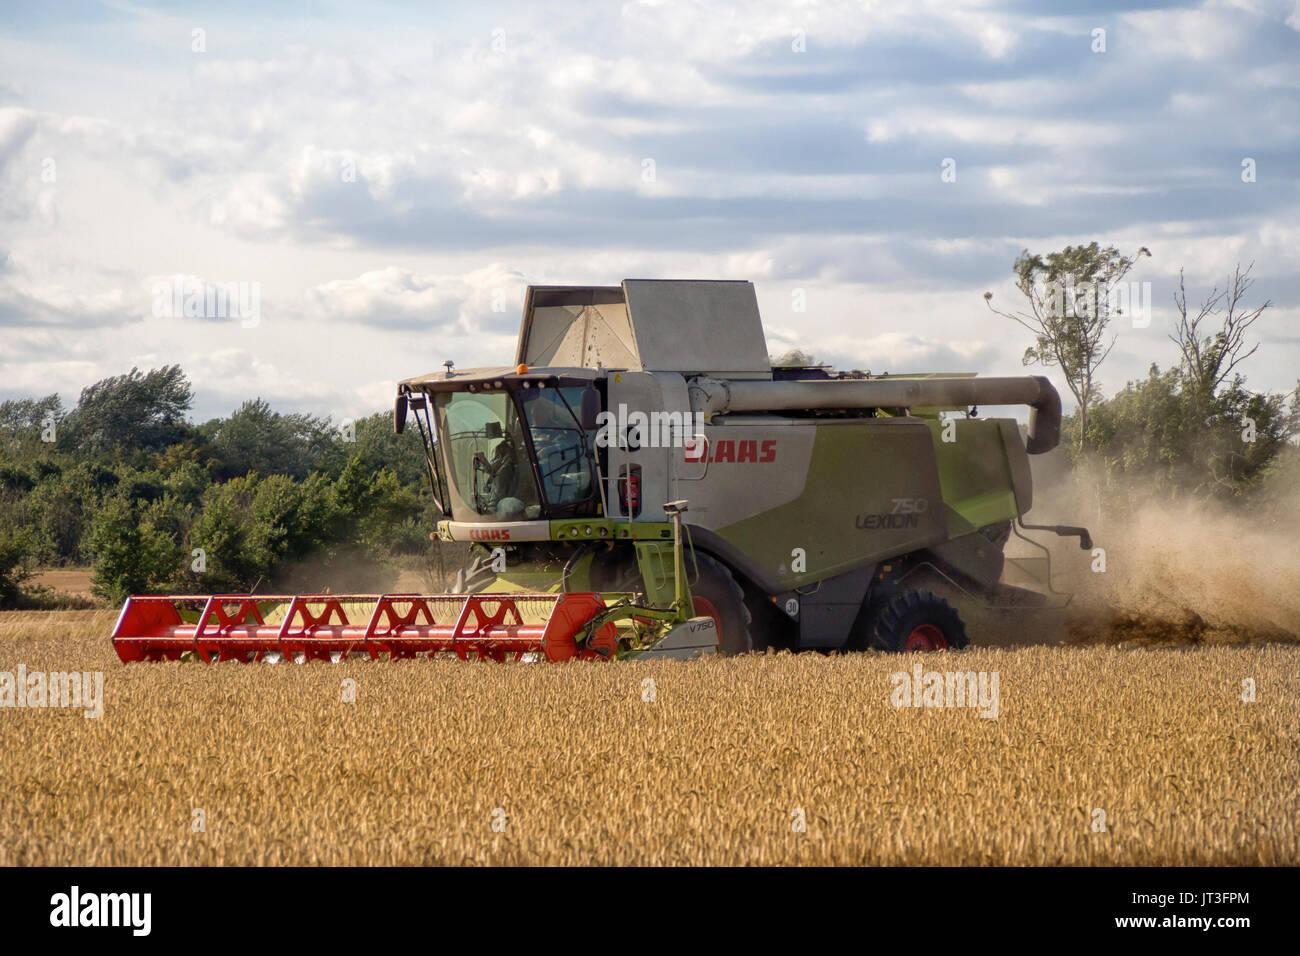 Combine harvesting wheat in rural Essex field - Stock Image